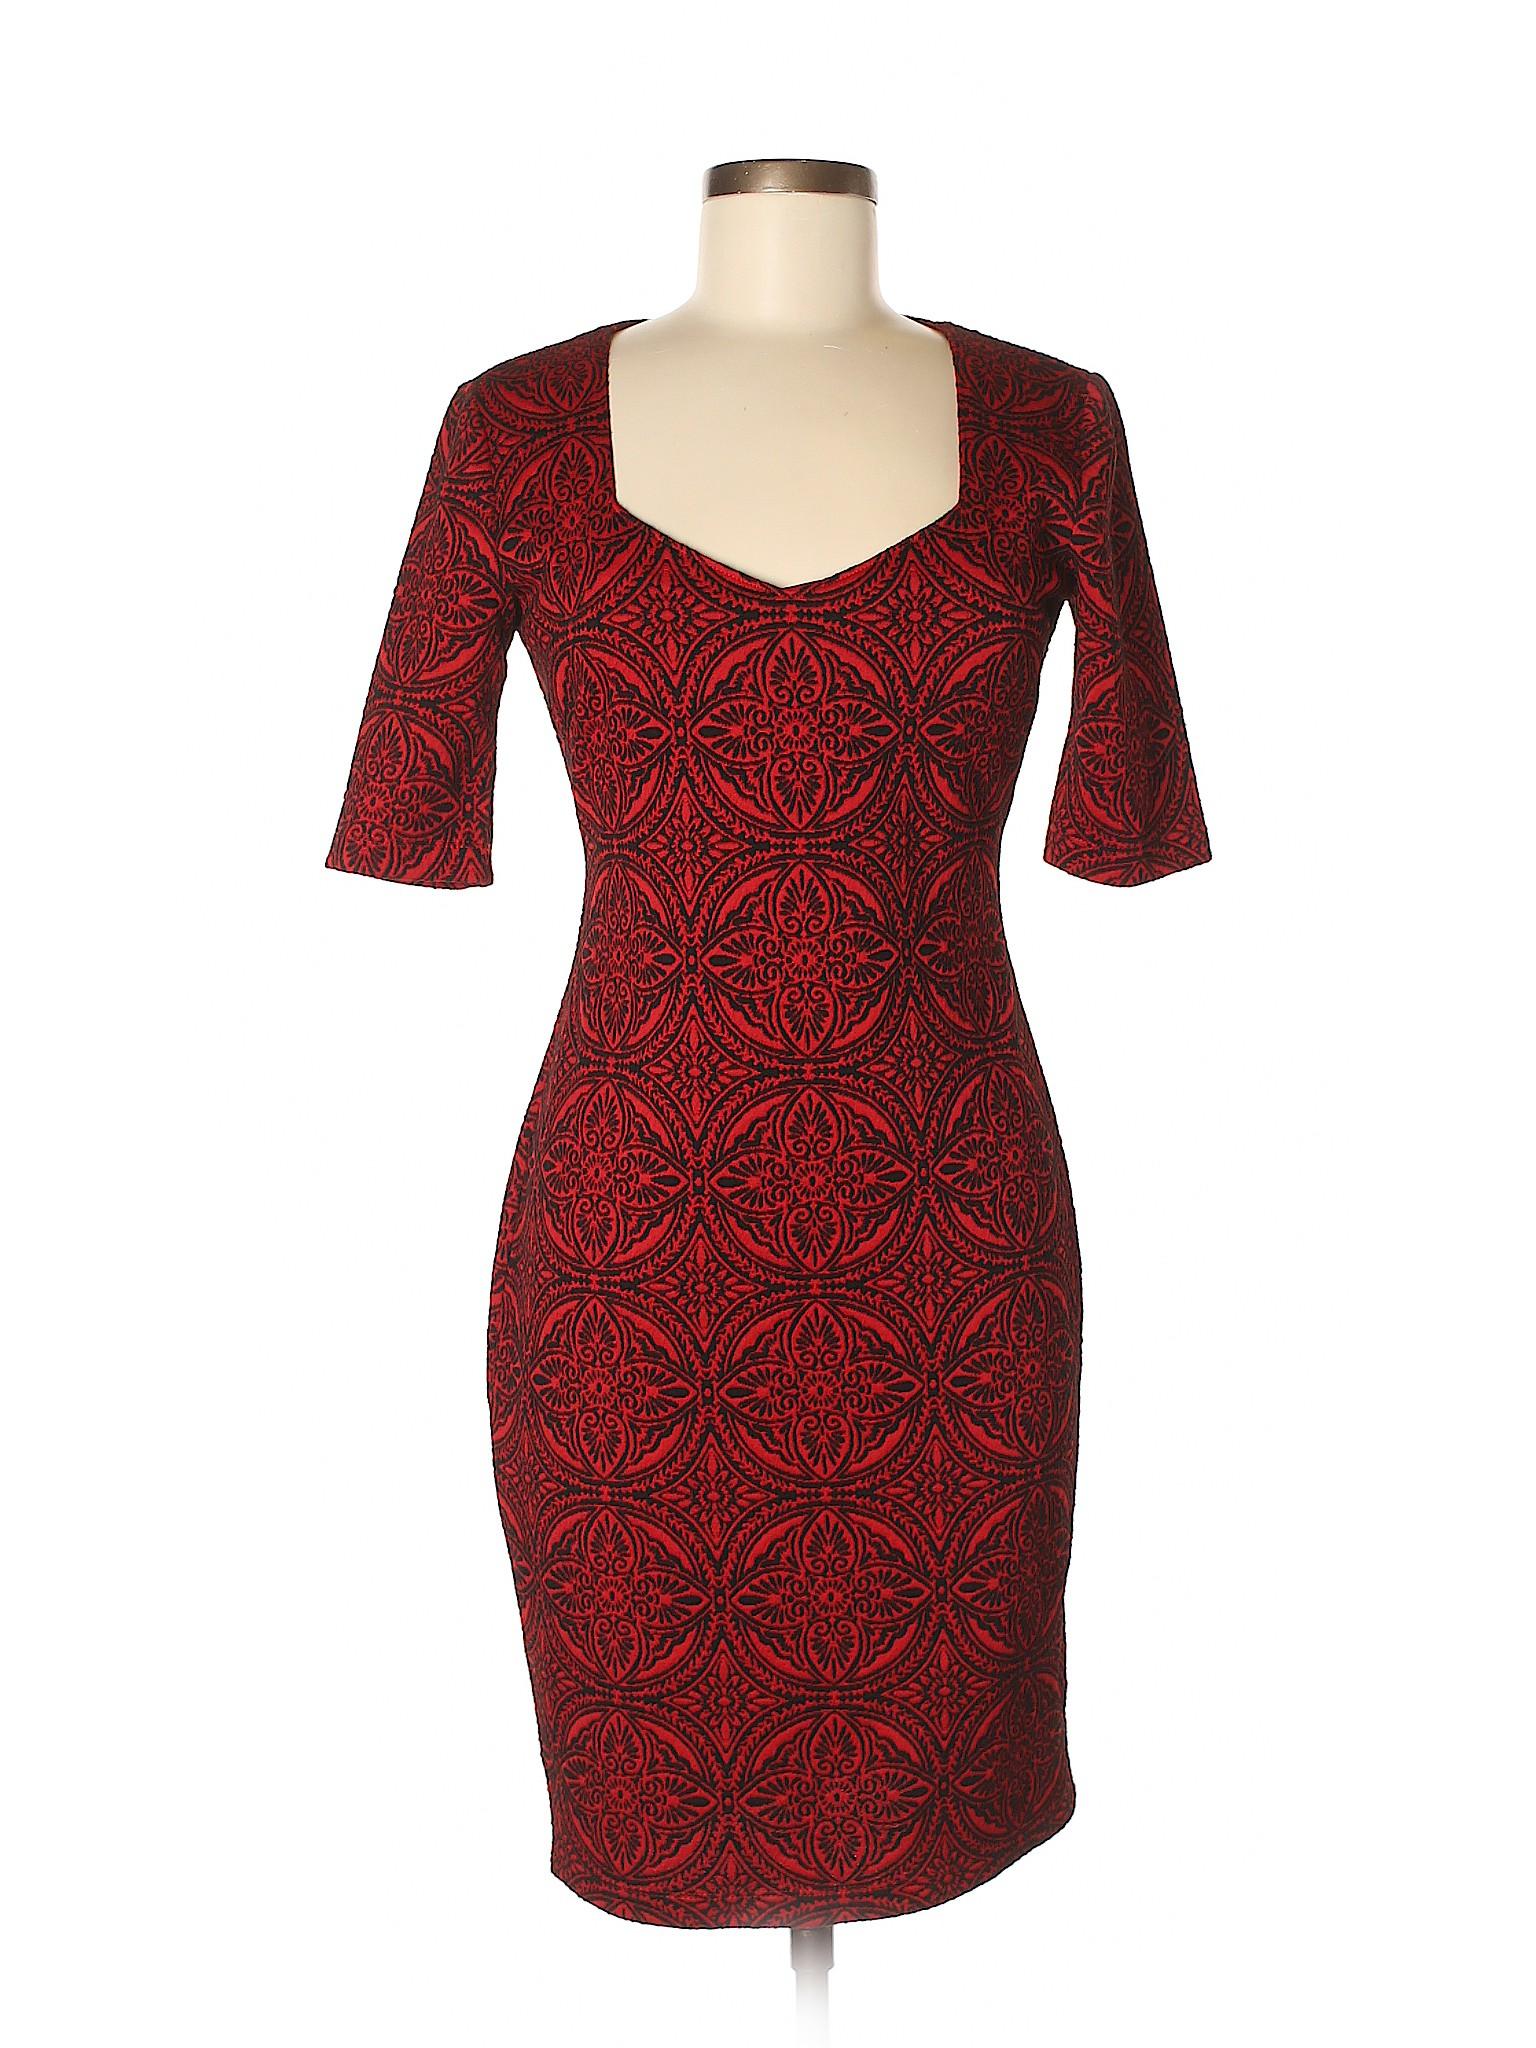 Selling Bisou Bisou Bisou Casual Selling Casual Bisou Dress Dress Selling p5YFBq